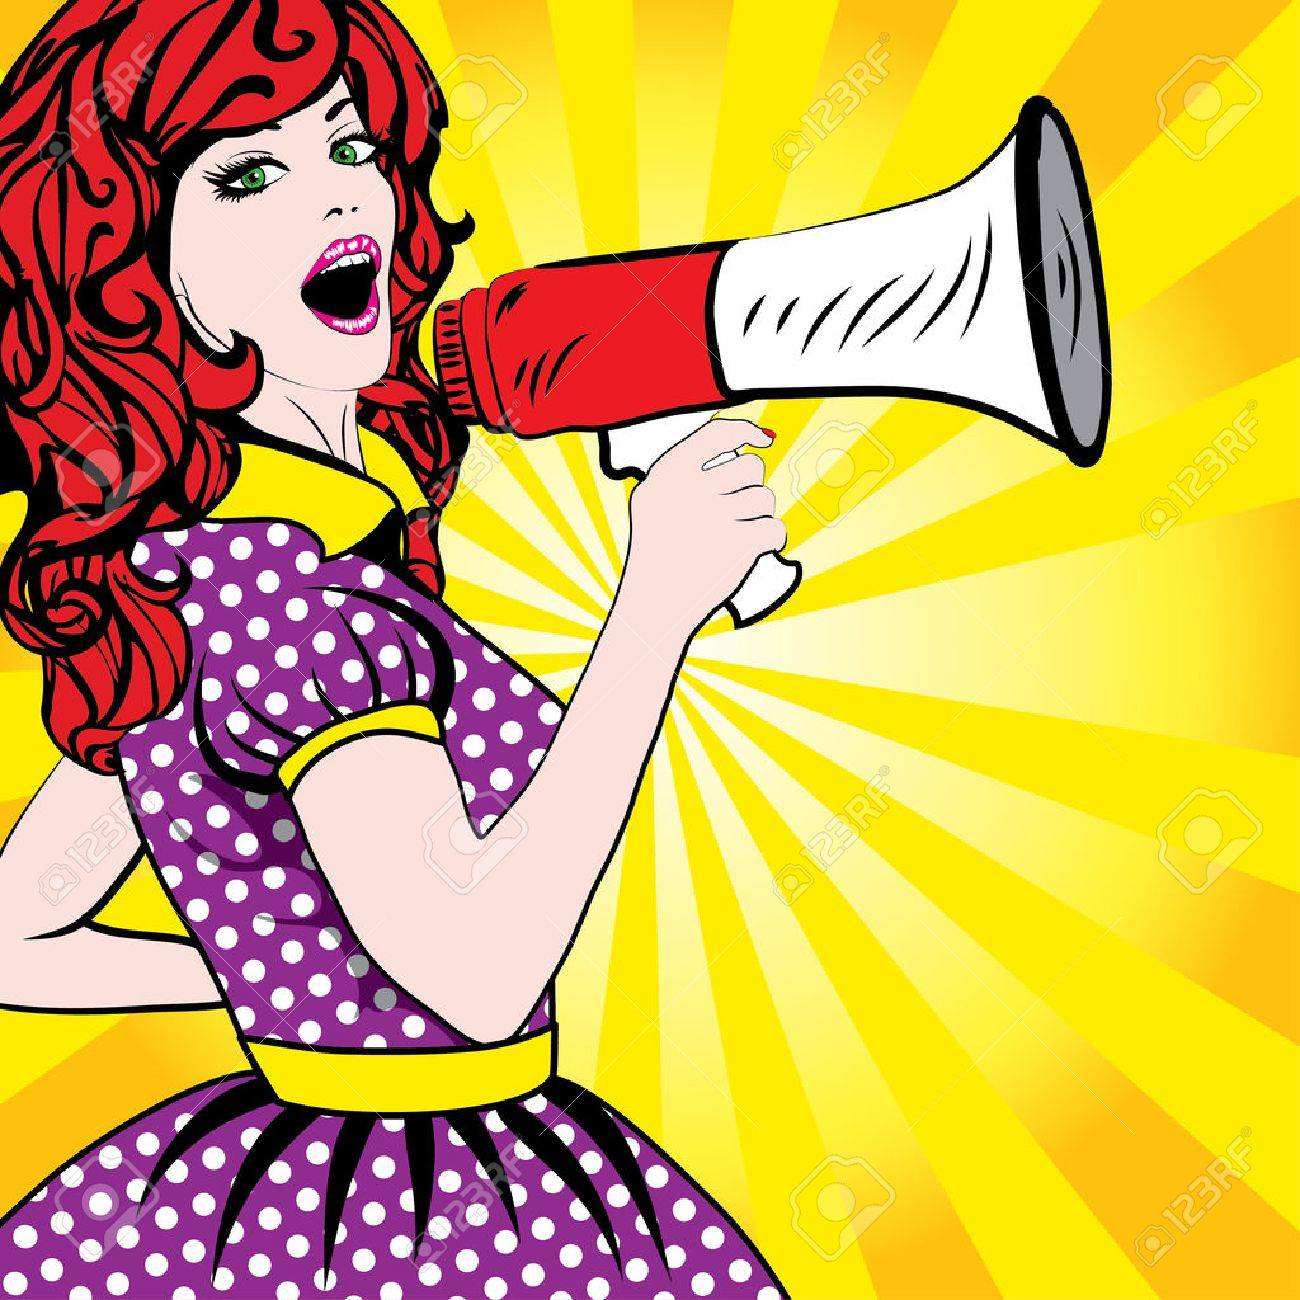 Pop art woman holding loudspeaker - 53424623